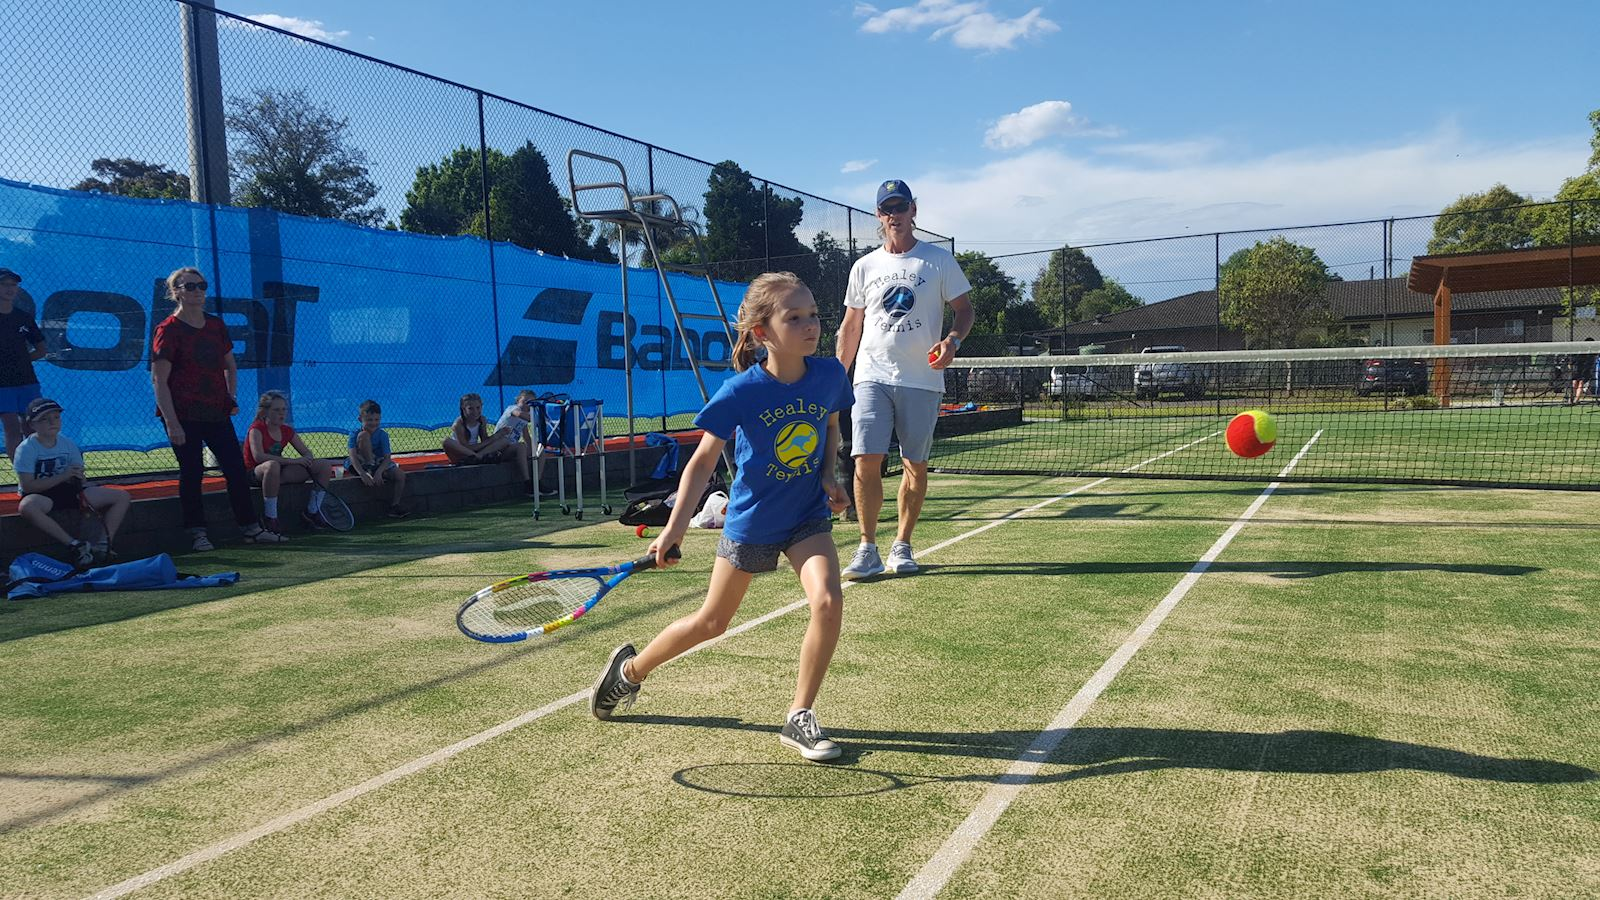 Healey Tennis